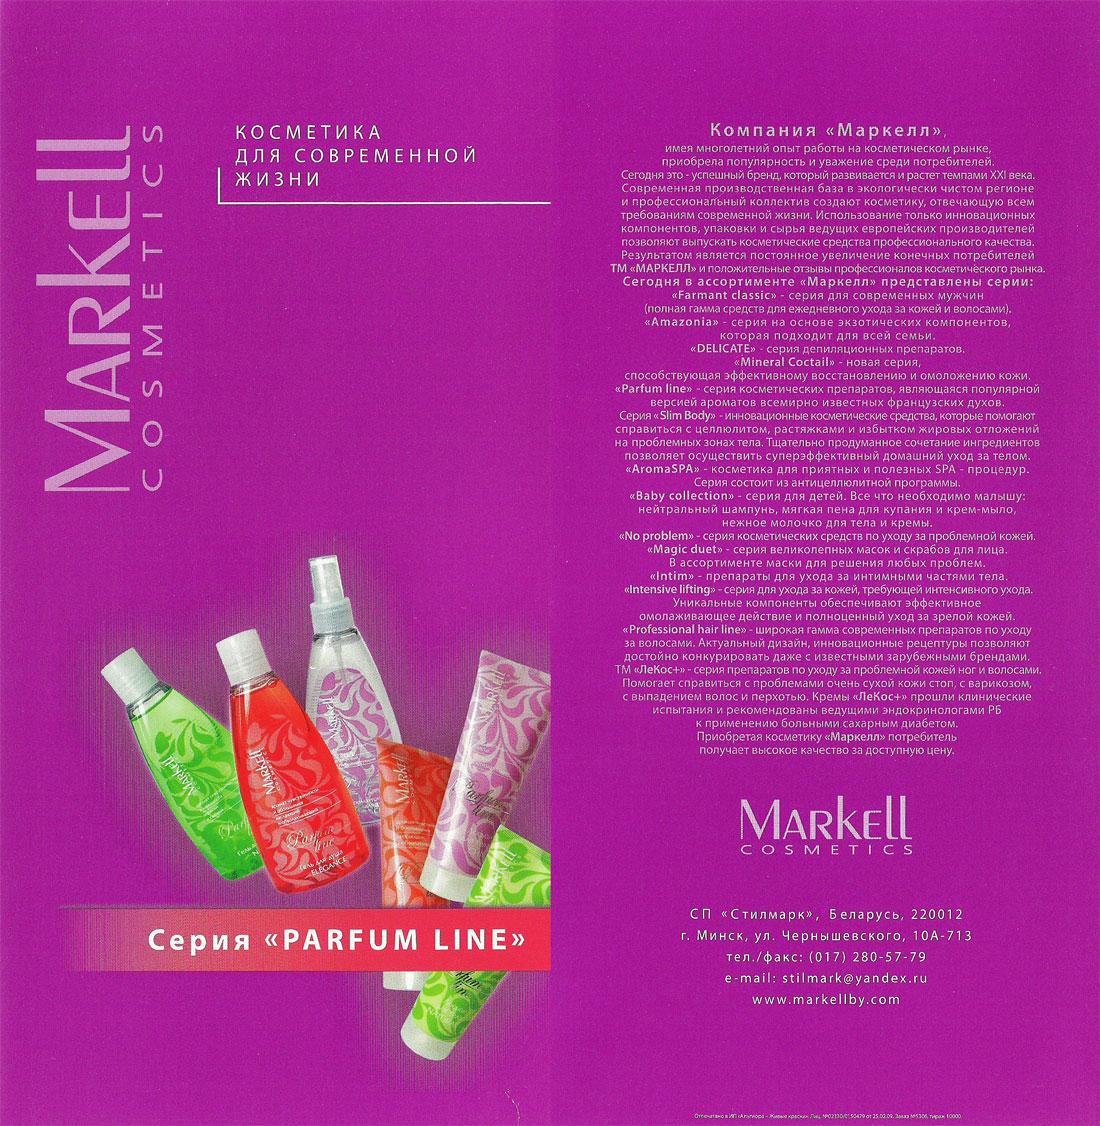 Маркелл серия Parfum Line